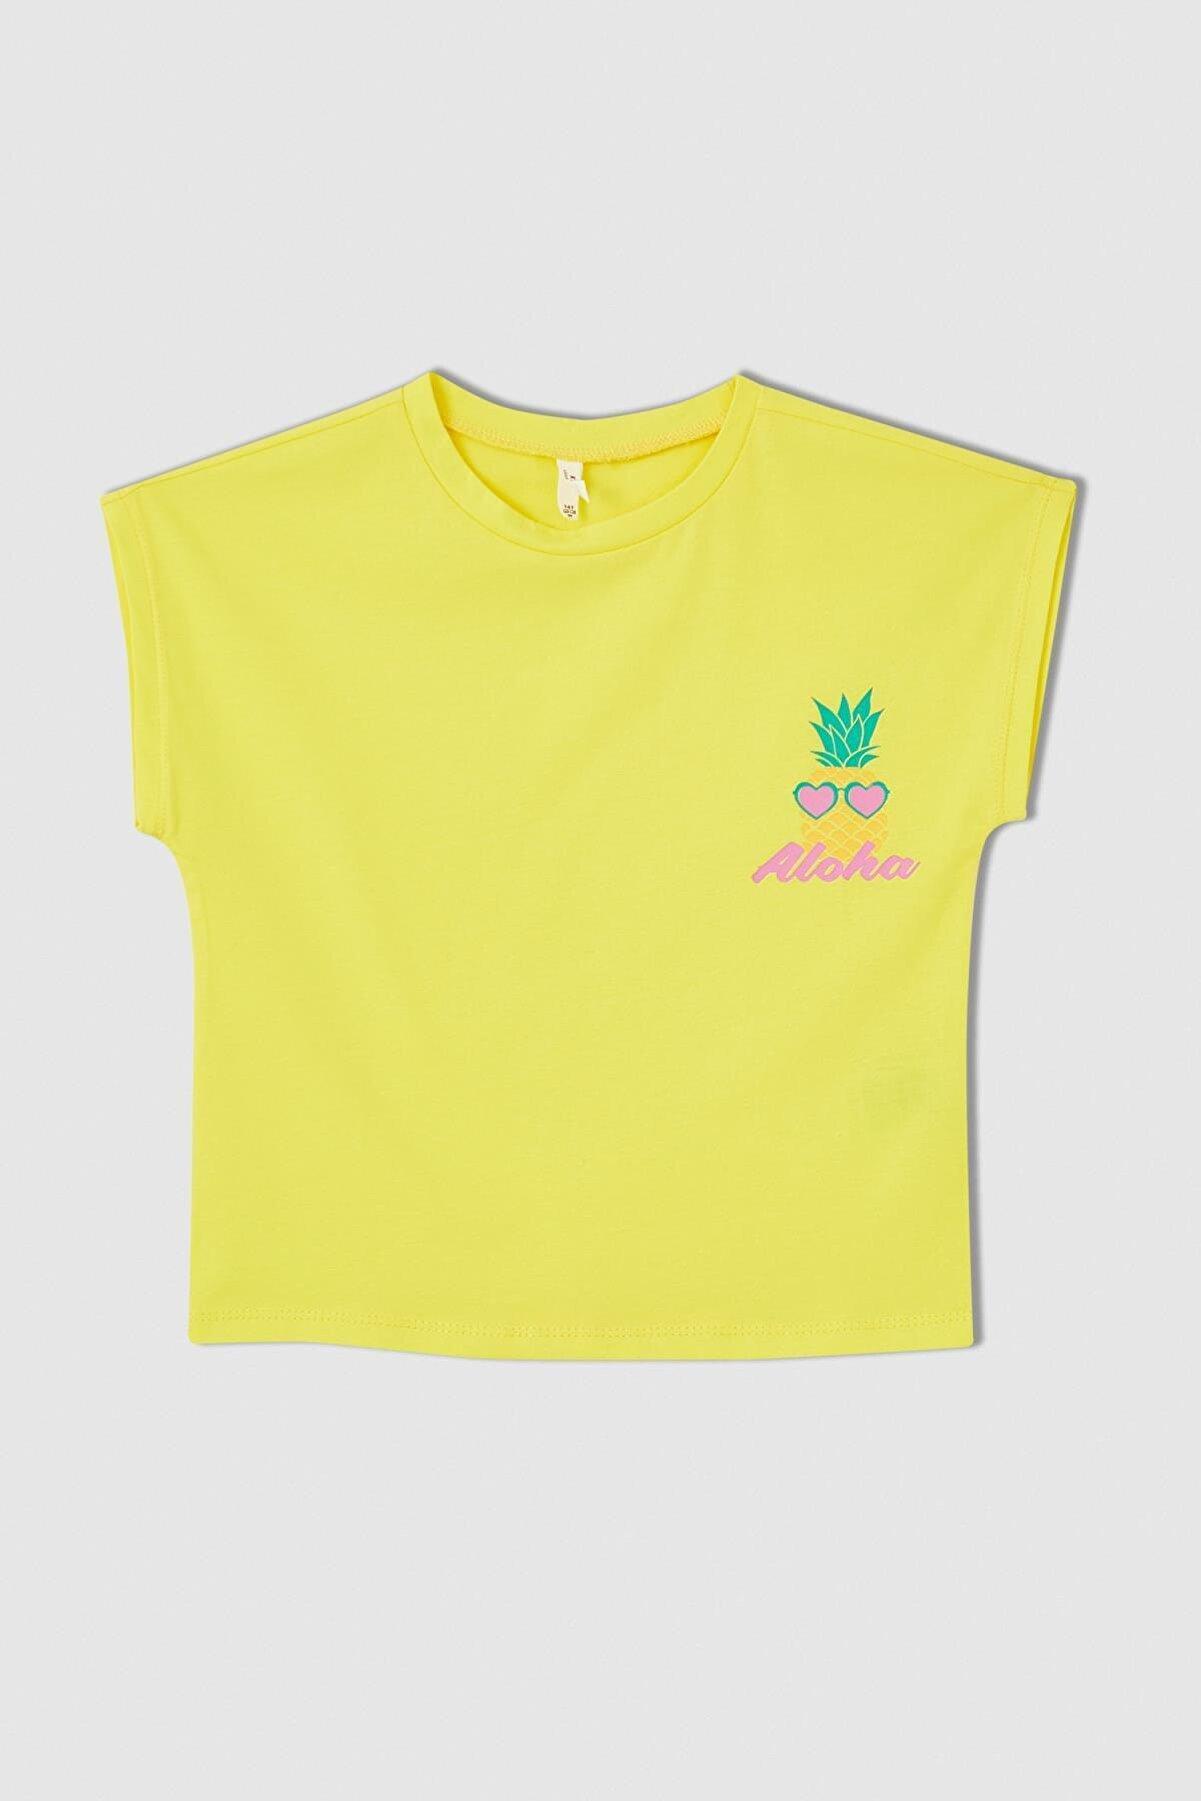 Defacto Kız Çocuk Ananas Baskılı Kısa Kollu Pamuklu Tişört